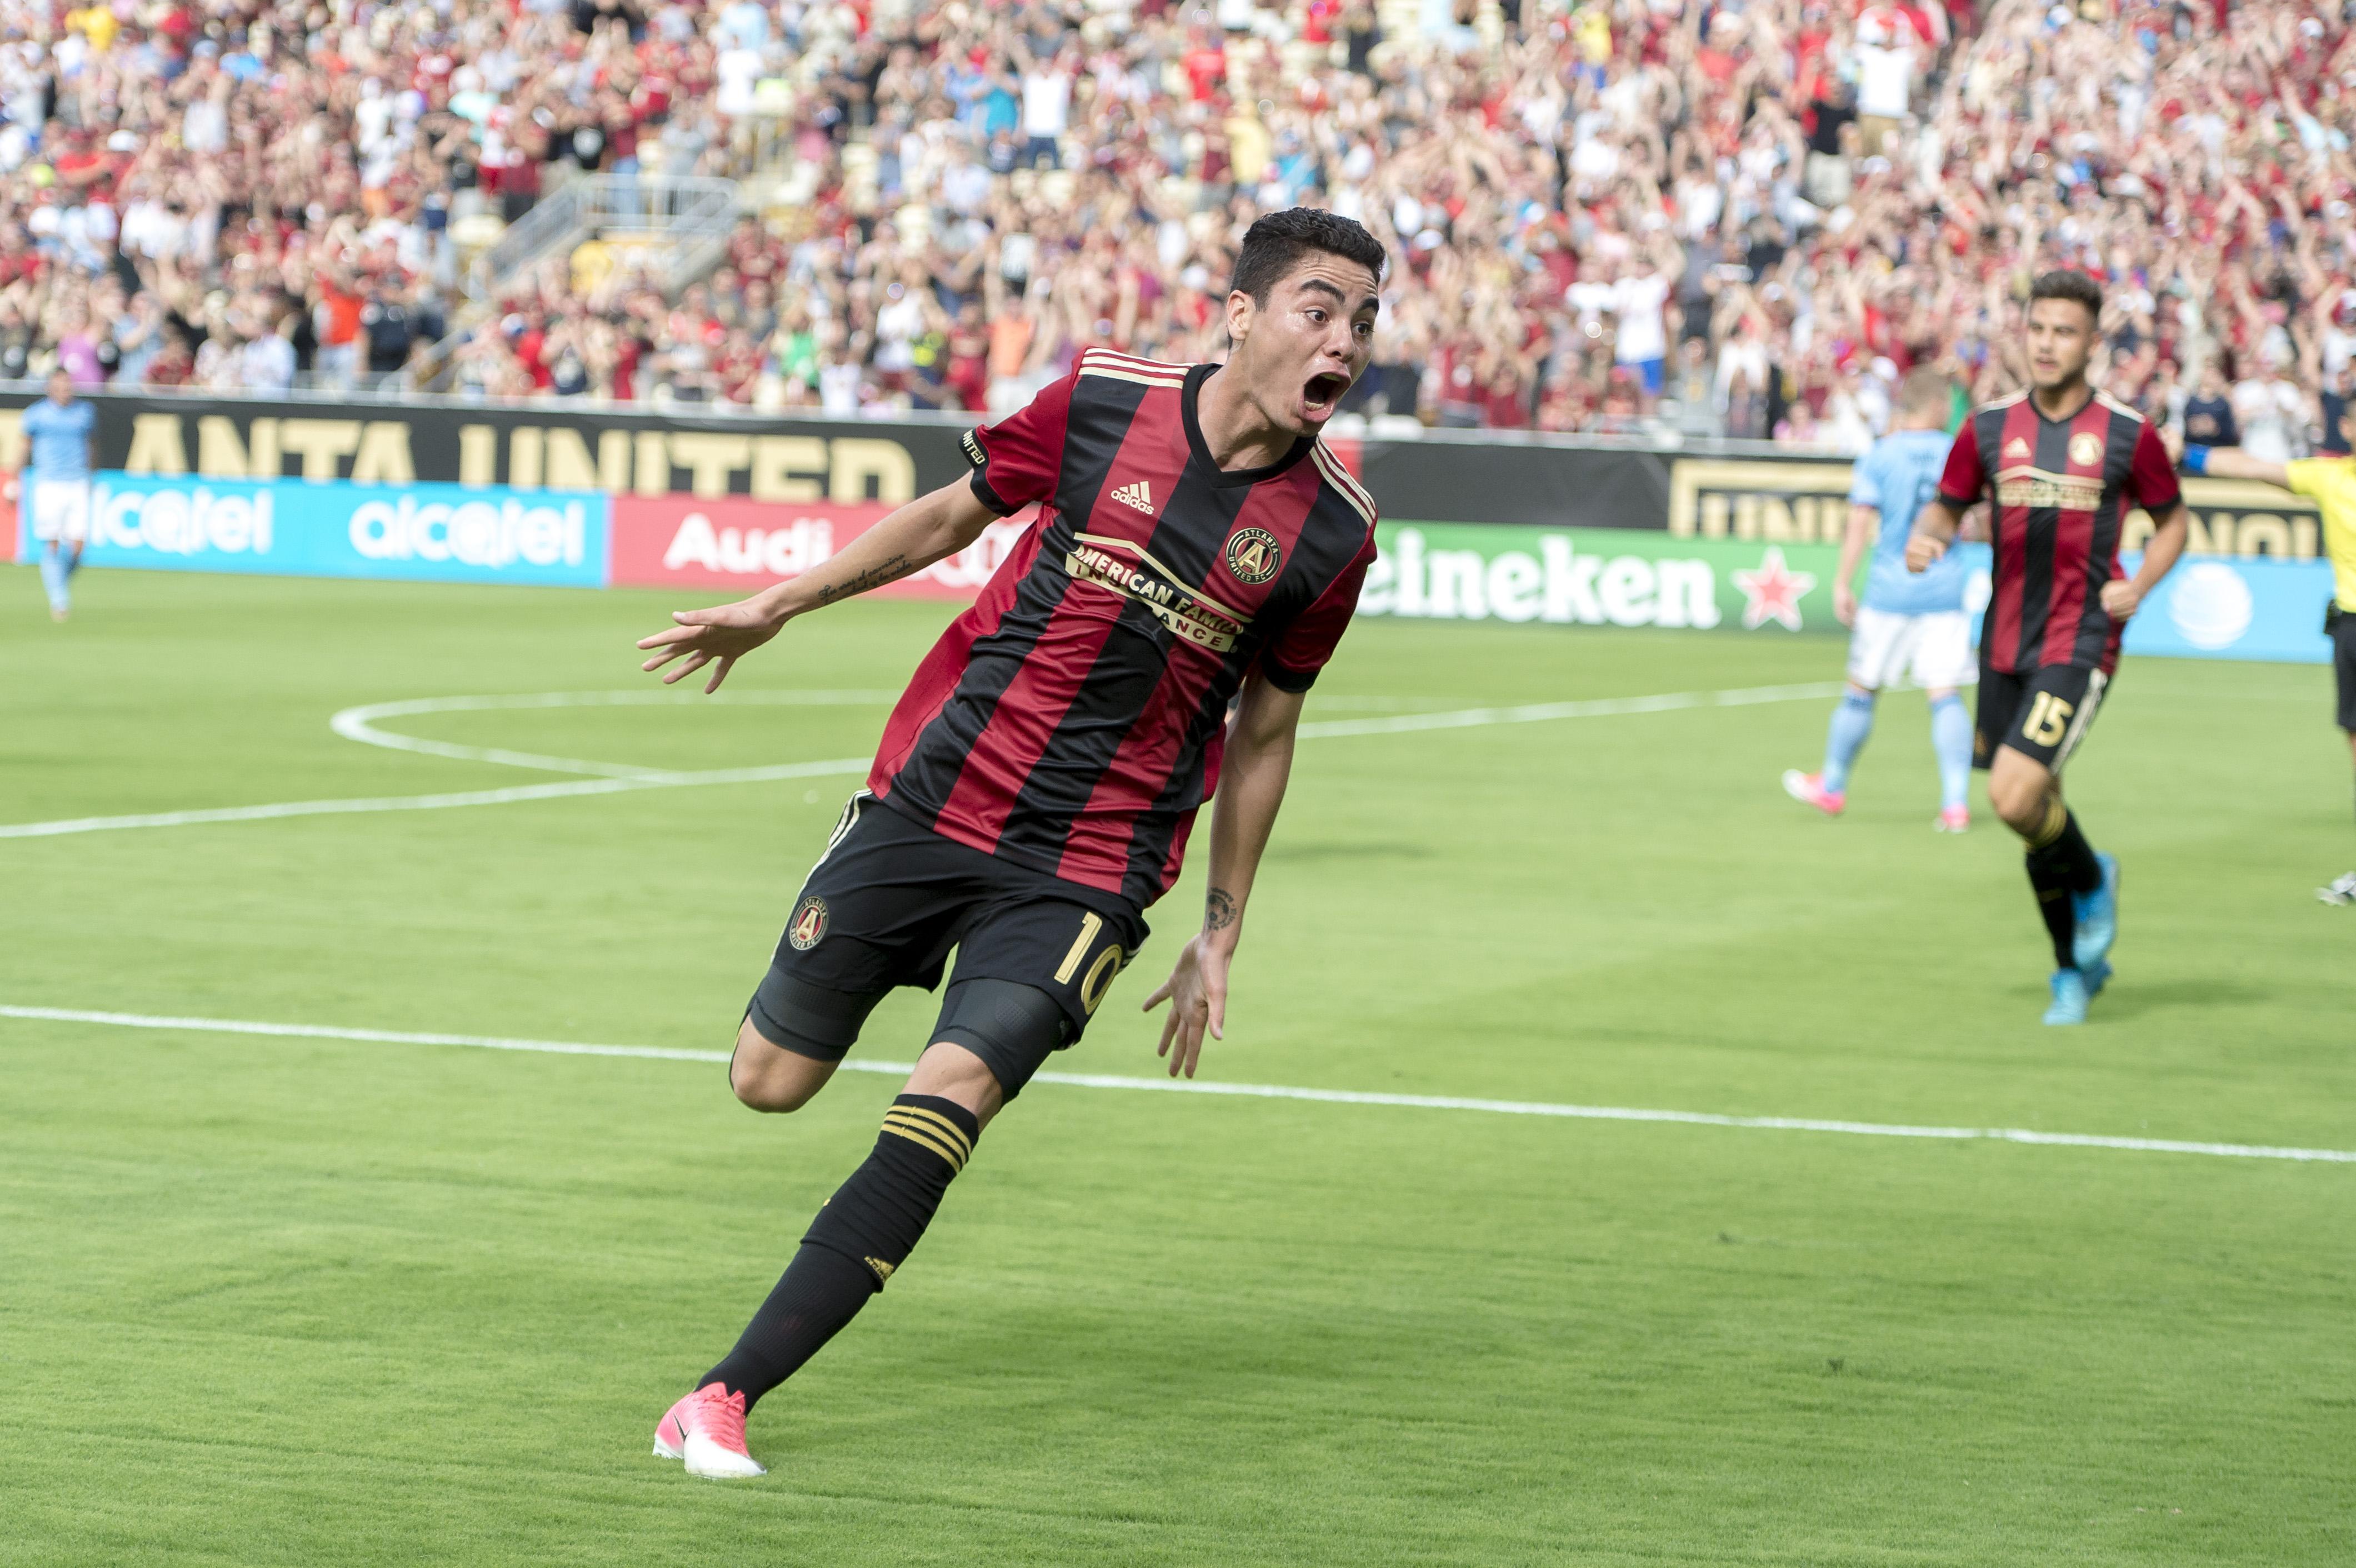 Miguel Almirn named to MLS Team of the Week in back to back weeks 4241x2823